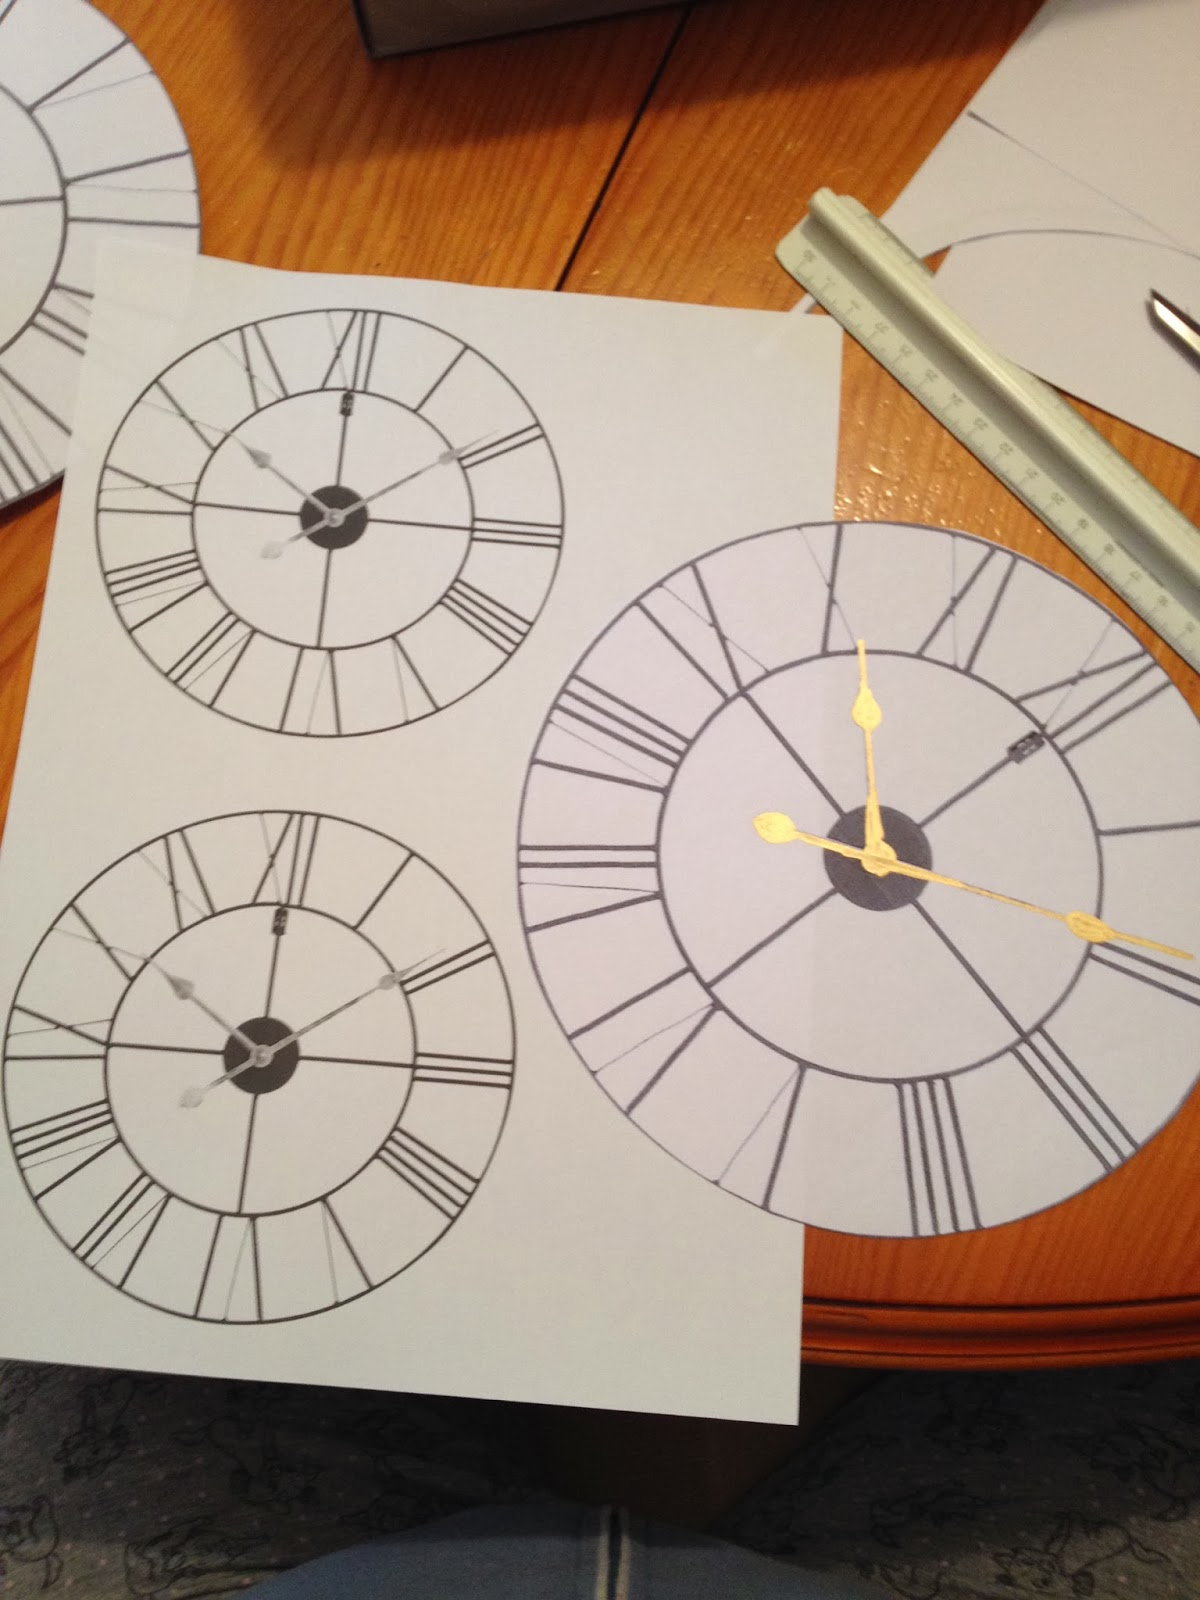 Manualidades amelia ideas para una decoraci n de nochevieja fin de a o - Manualidades relojes de pared ...